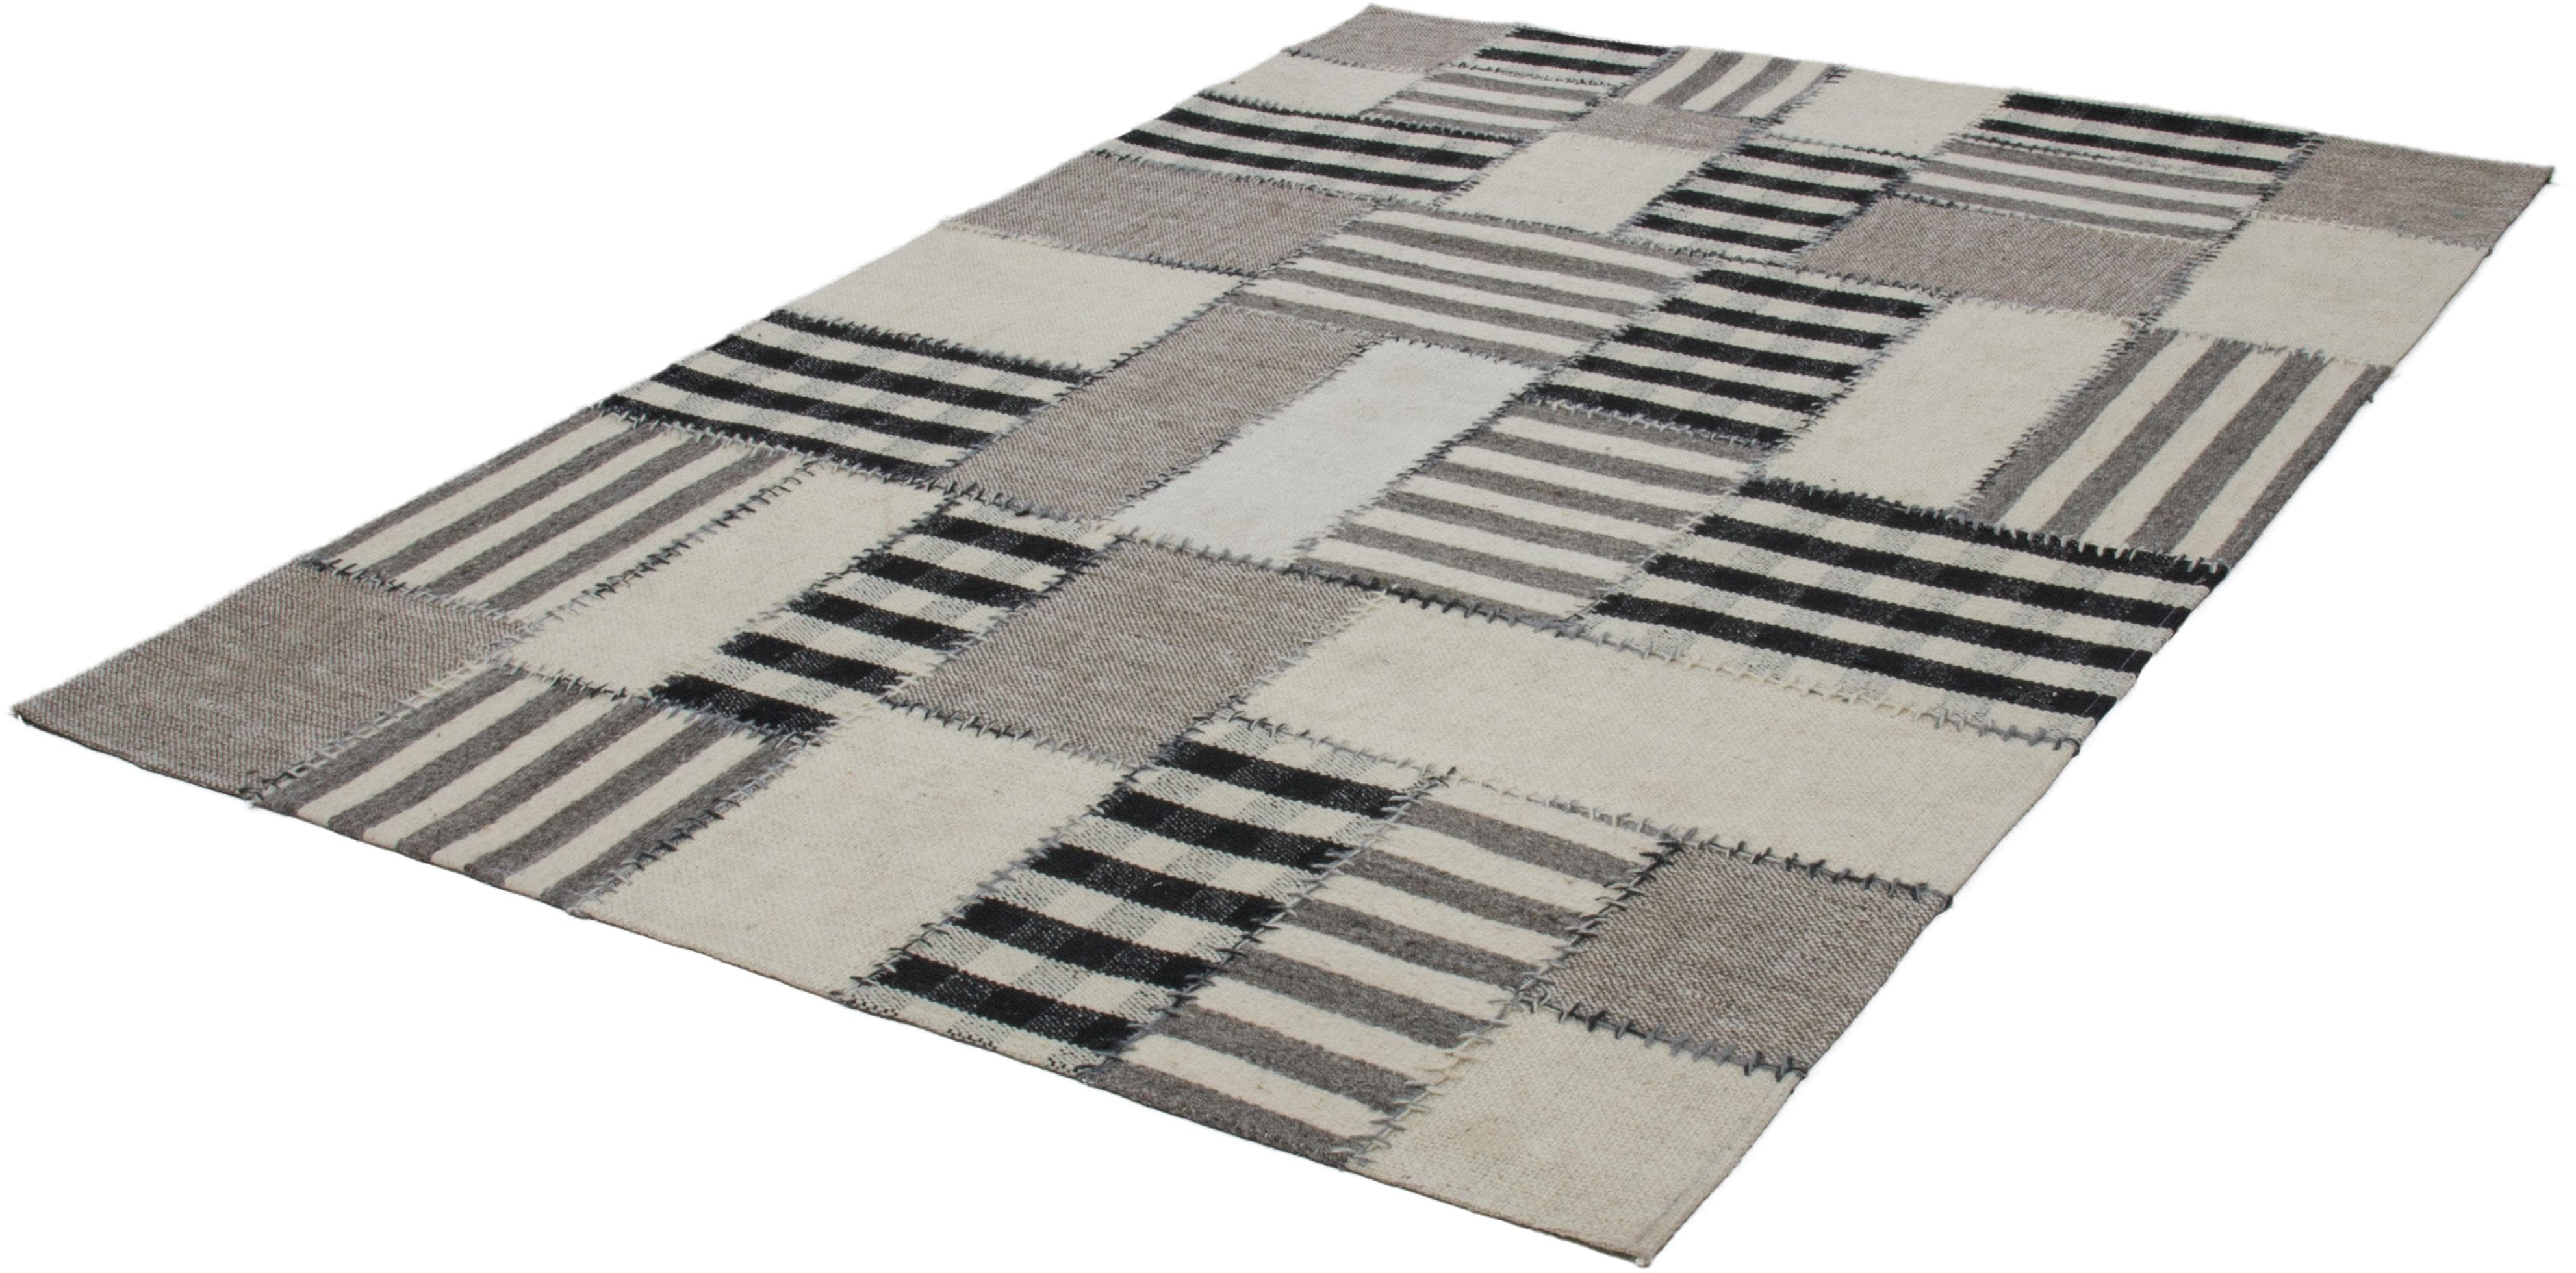 Teppich Liana 214 Kayoom rechteckig Höhe 6 mm handgewebt